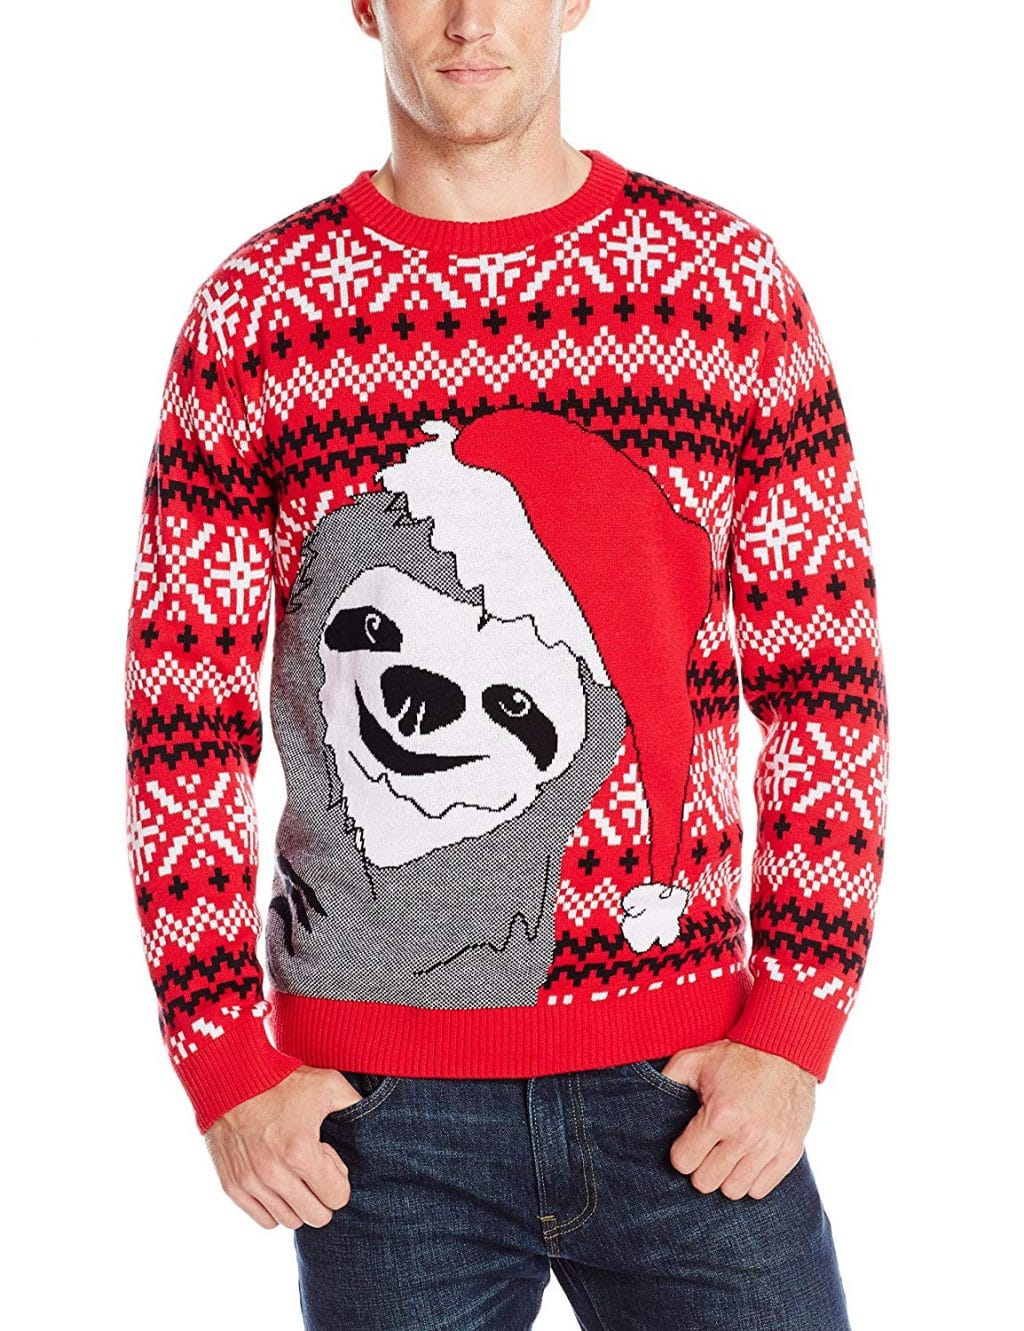 Anti Kersttrui.Ugly Christmas Sweater Sale 2019